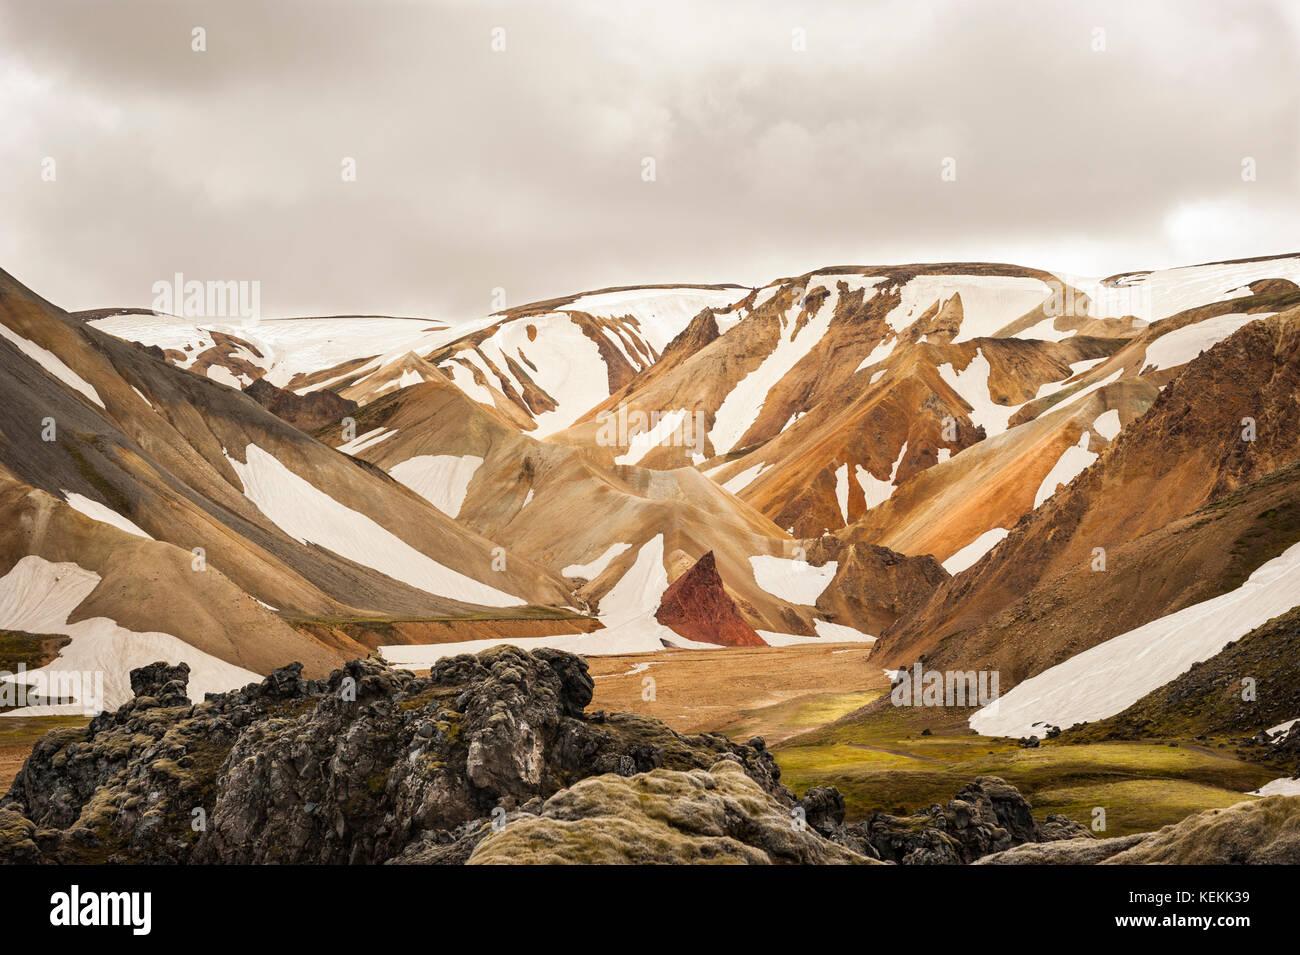 landmannalaugarlandmannalaugavegur-colourful-mountains-still-covered-KEKK39.jpg